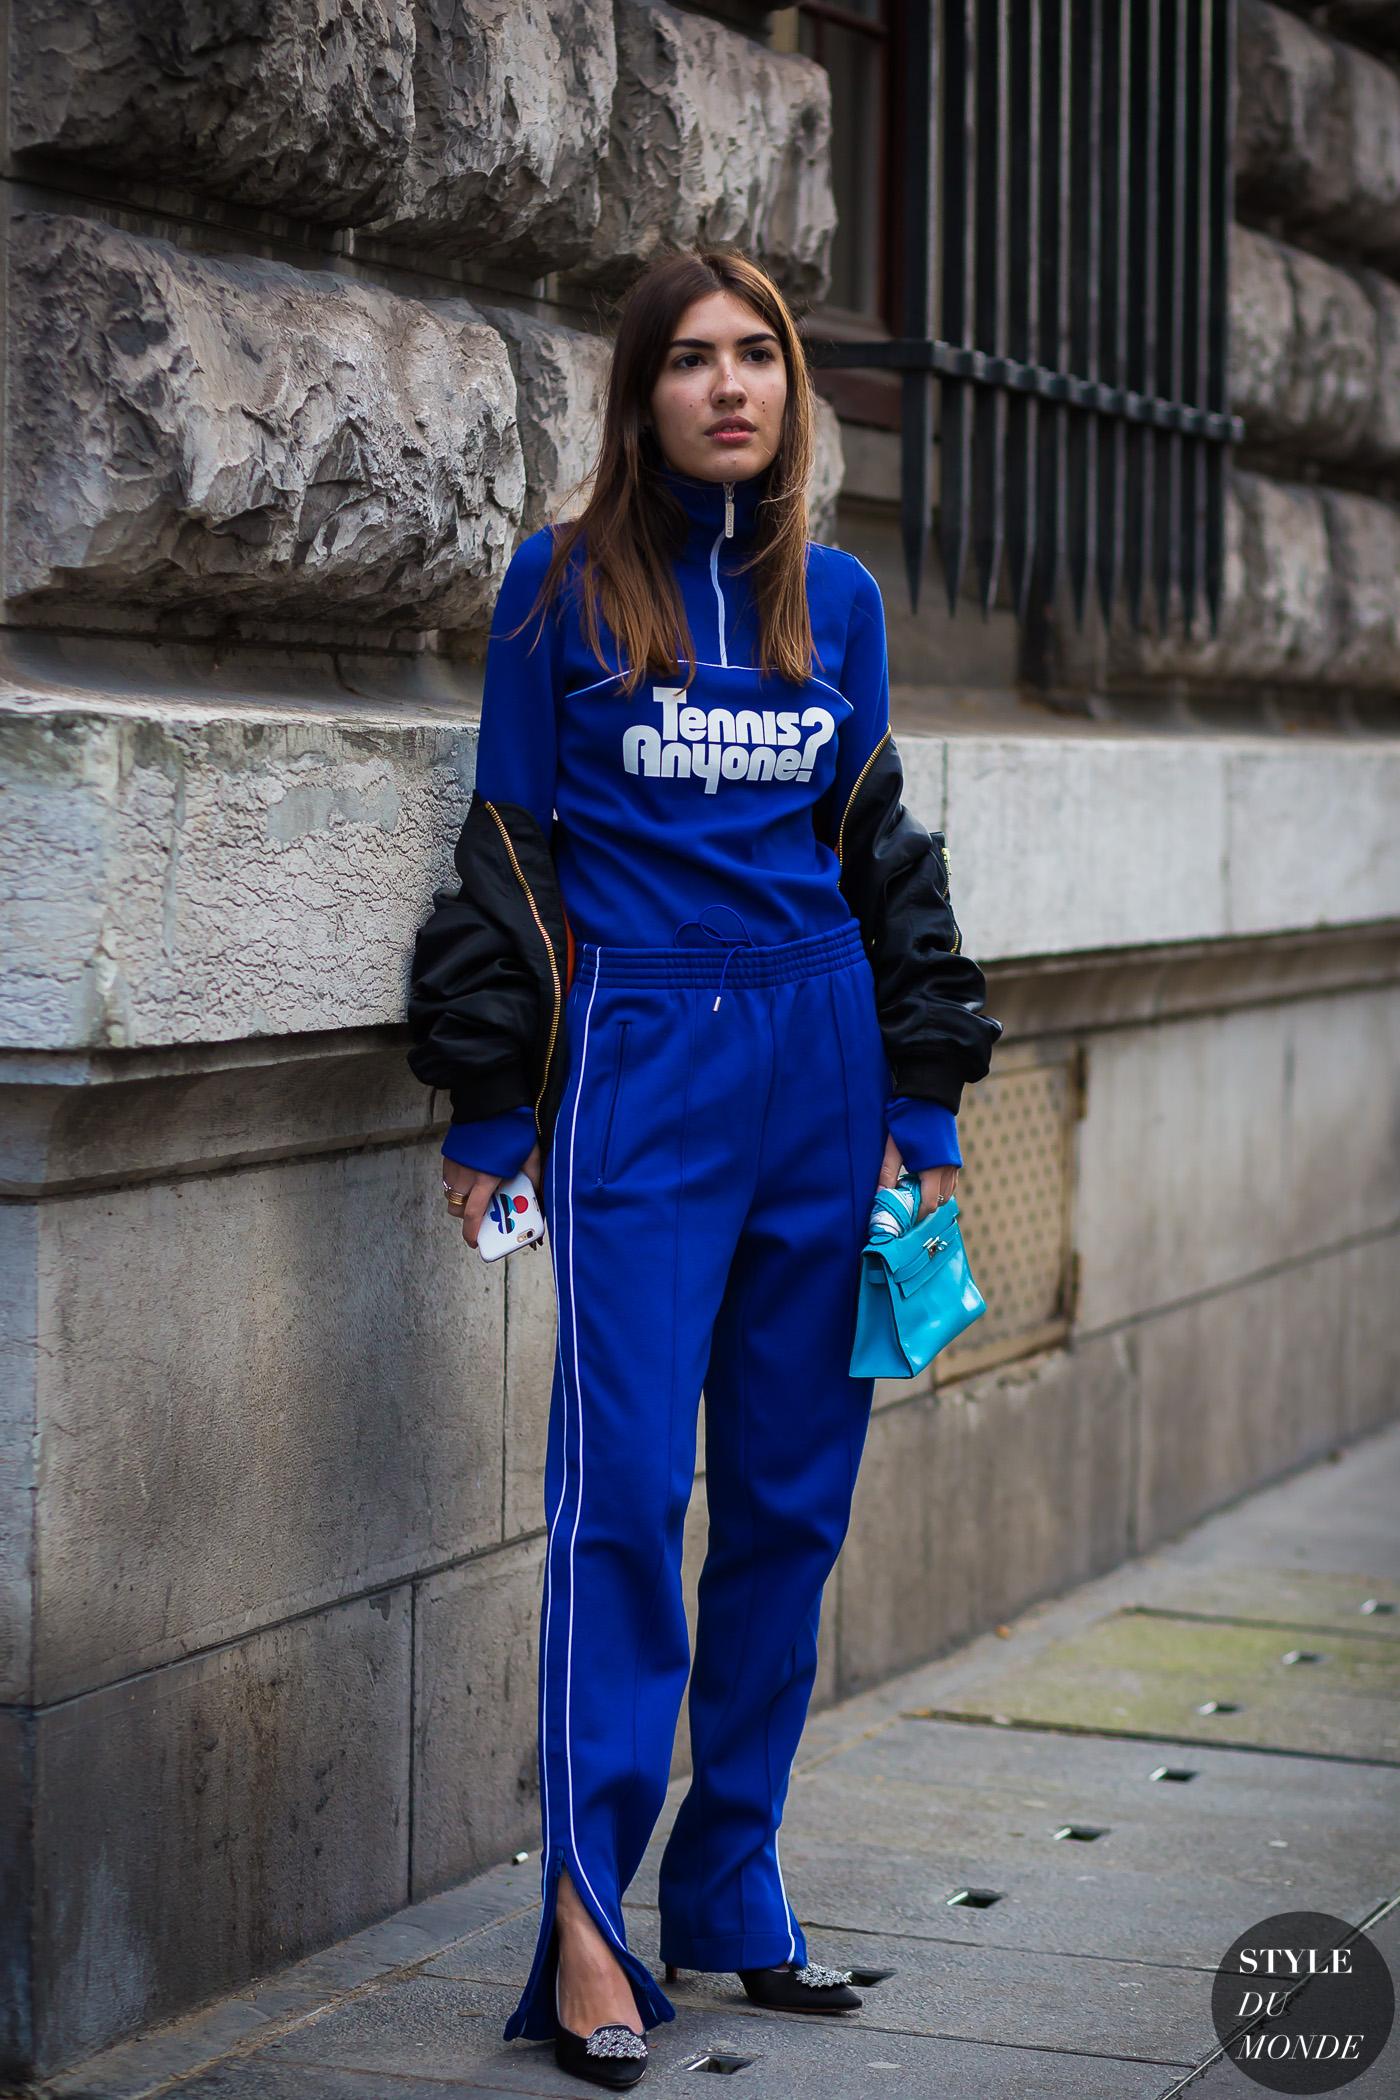 a490c7bc90741 Paris Fashion Week FW 2016 Street Style  Patricia Manfield